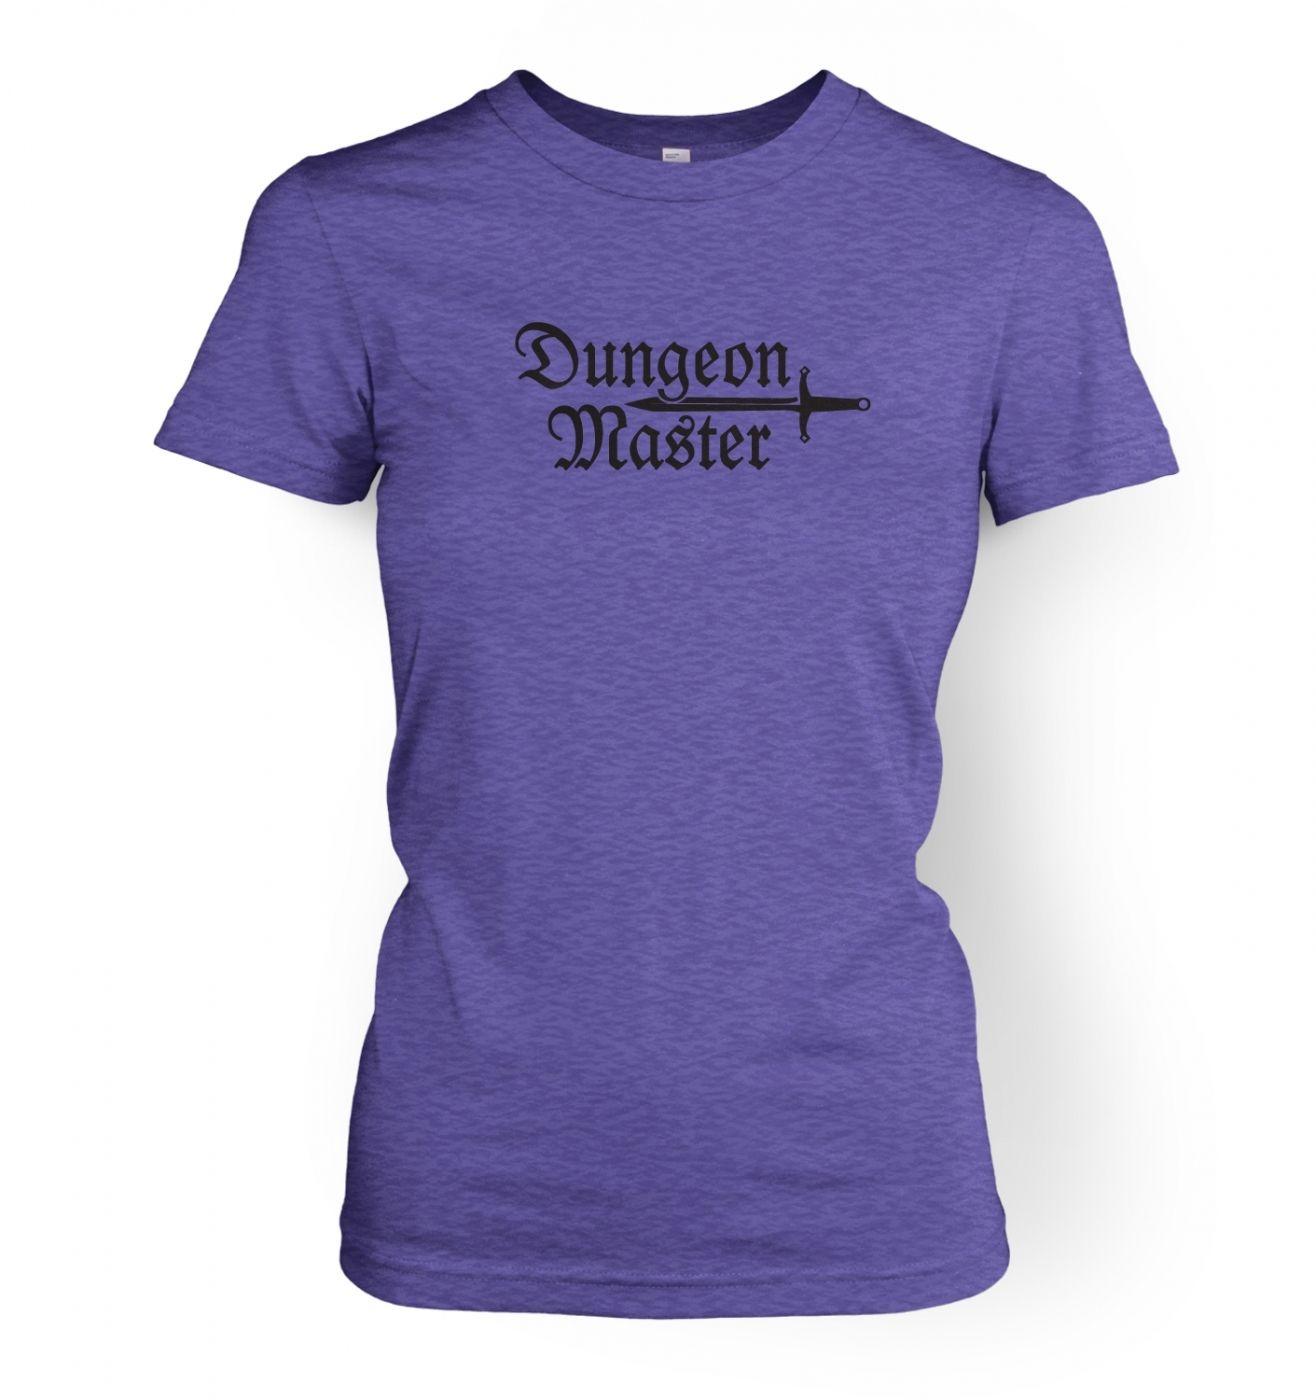 Women's Dungeon Master t-shirt